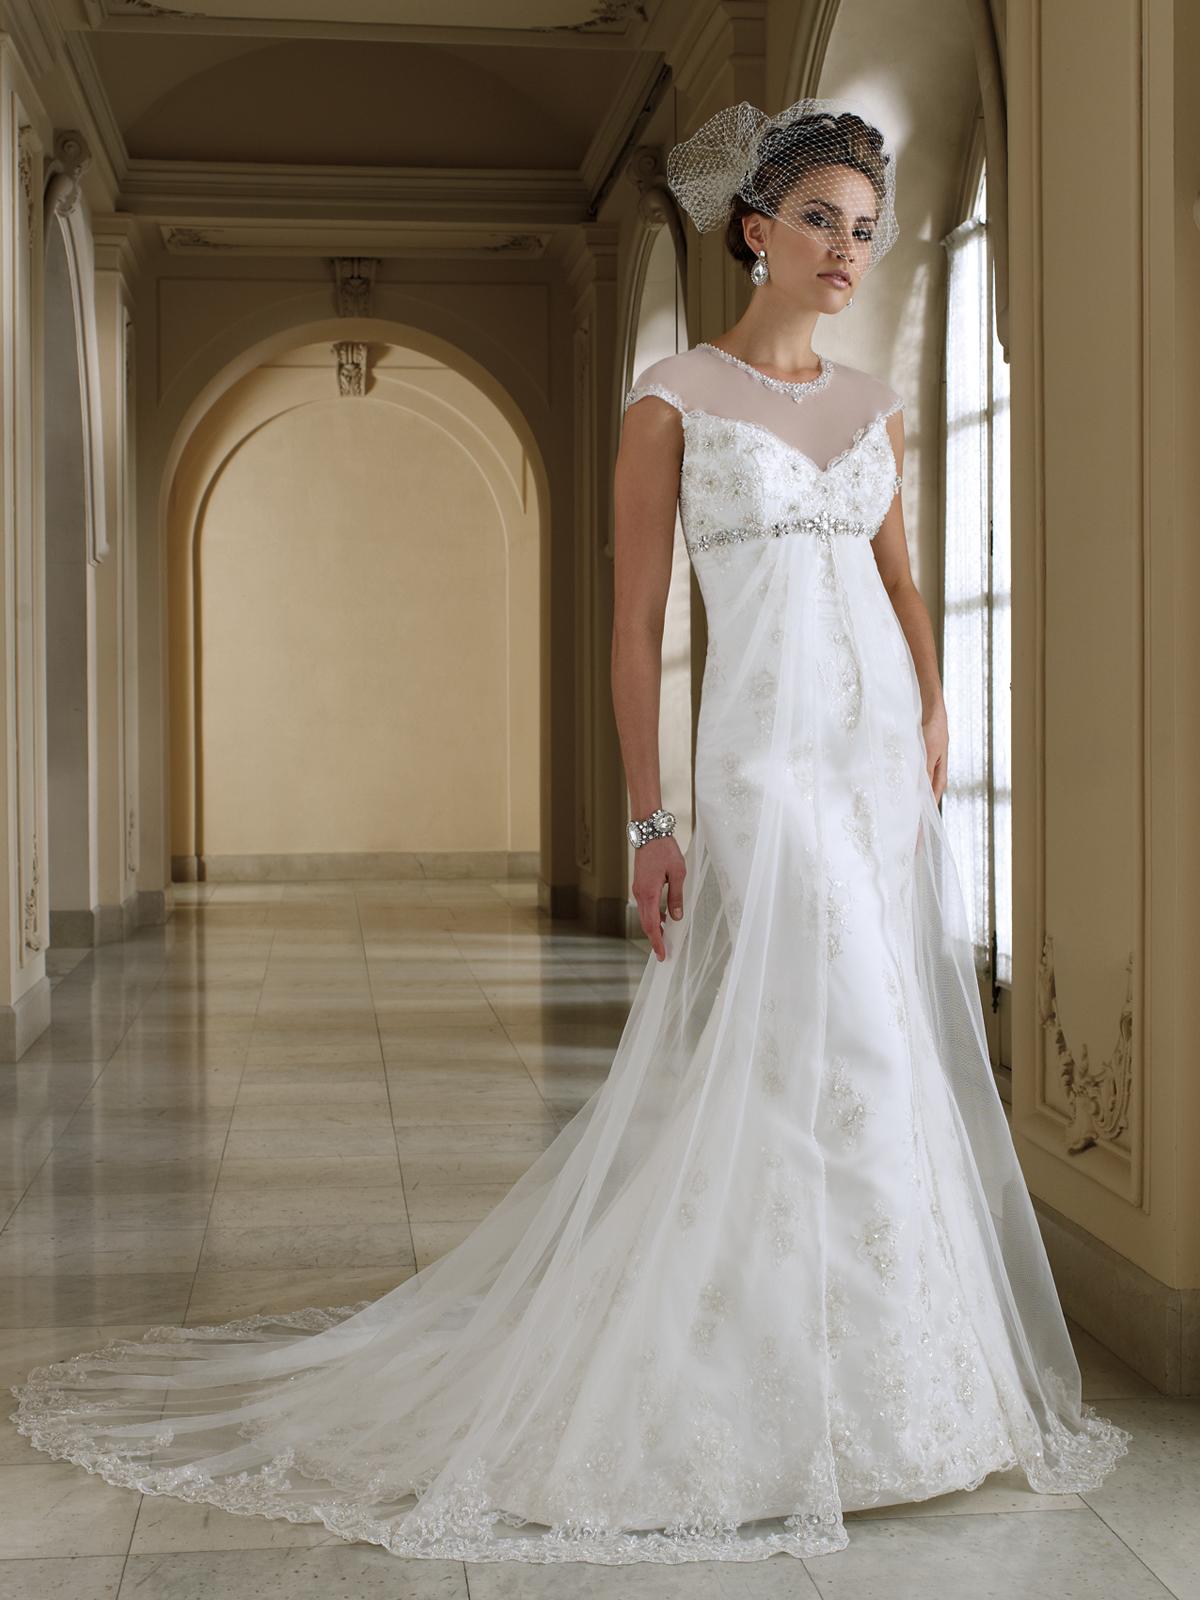 2012 wedding dress david tutera for mon cheri bridal gowns 112205. Black Bedroom Furniture Sets. Home Design Ideas